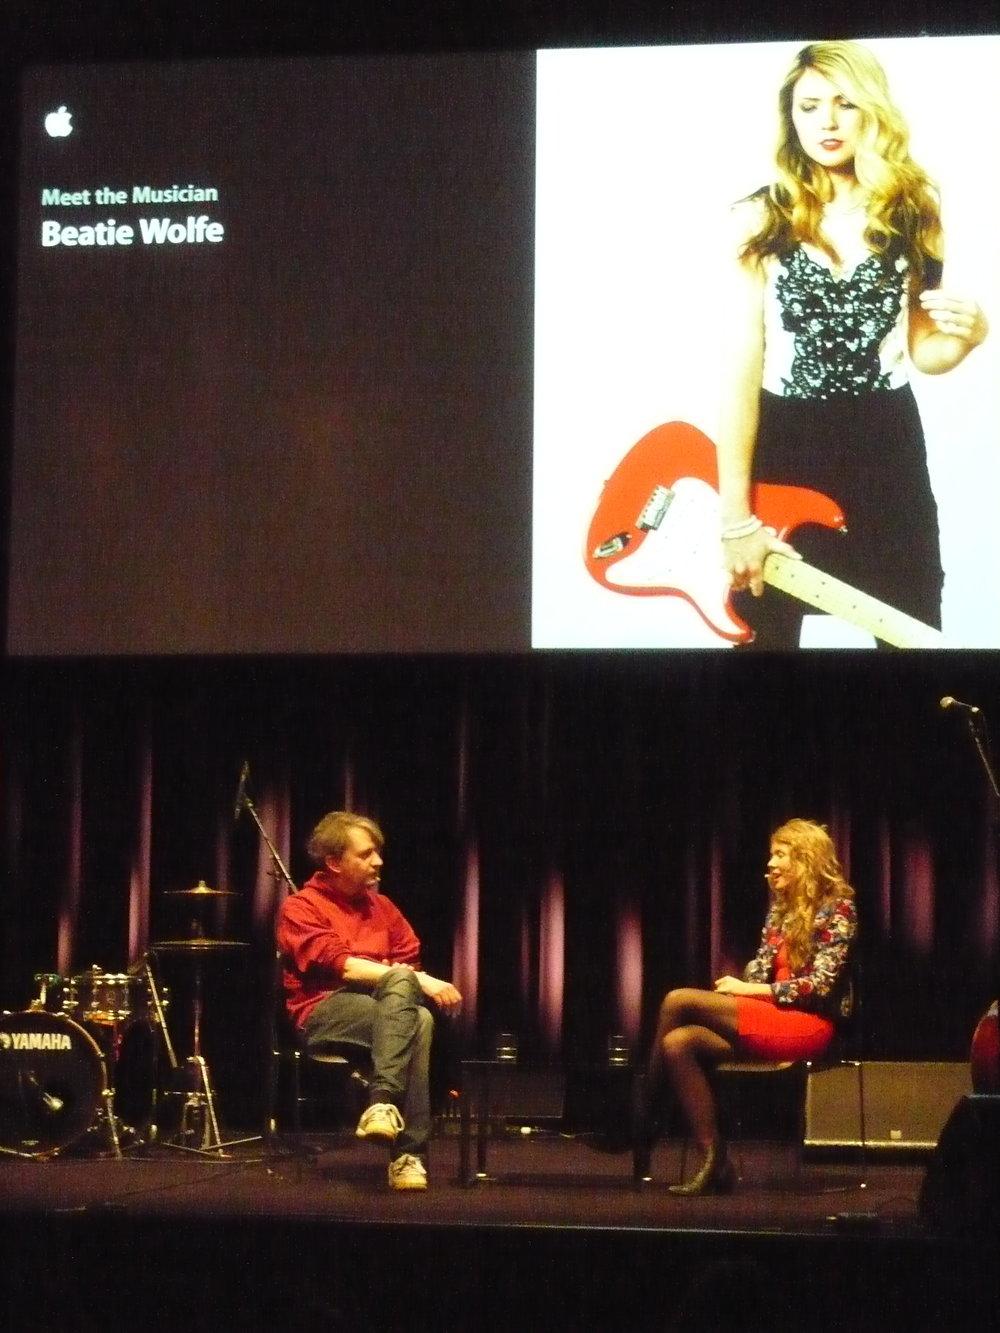 Beatie Wolfe and De:Bug's Editor Sacha Kösch